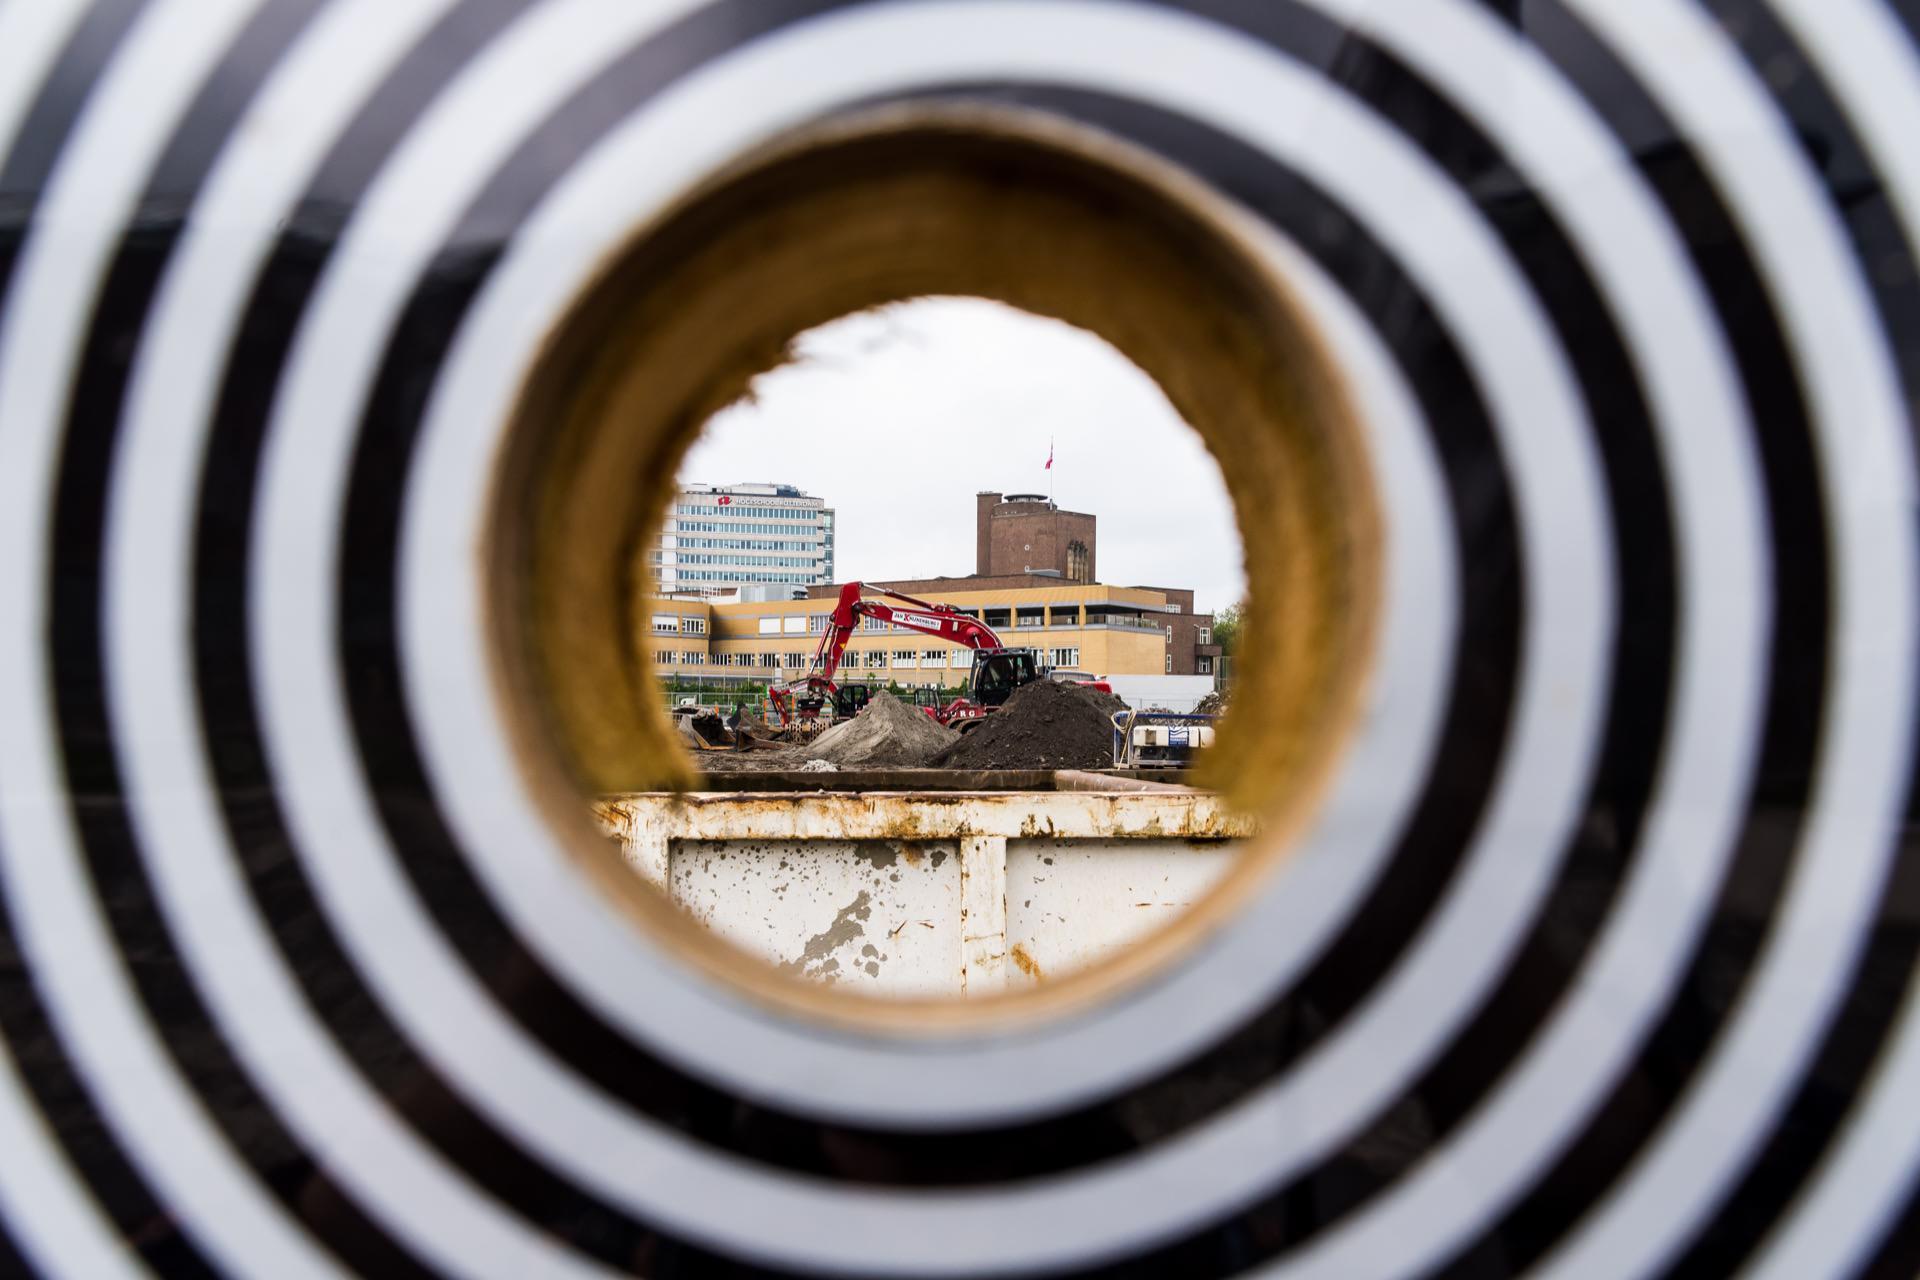 Patrick Dreuning  Heartbeat of construction #3